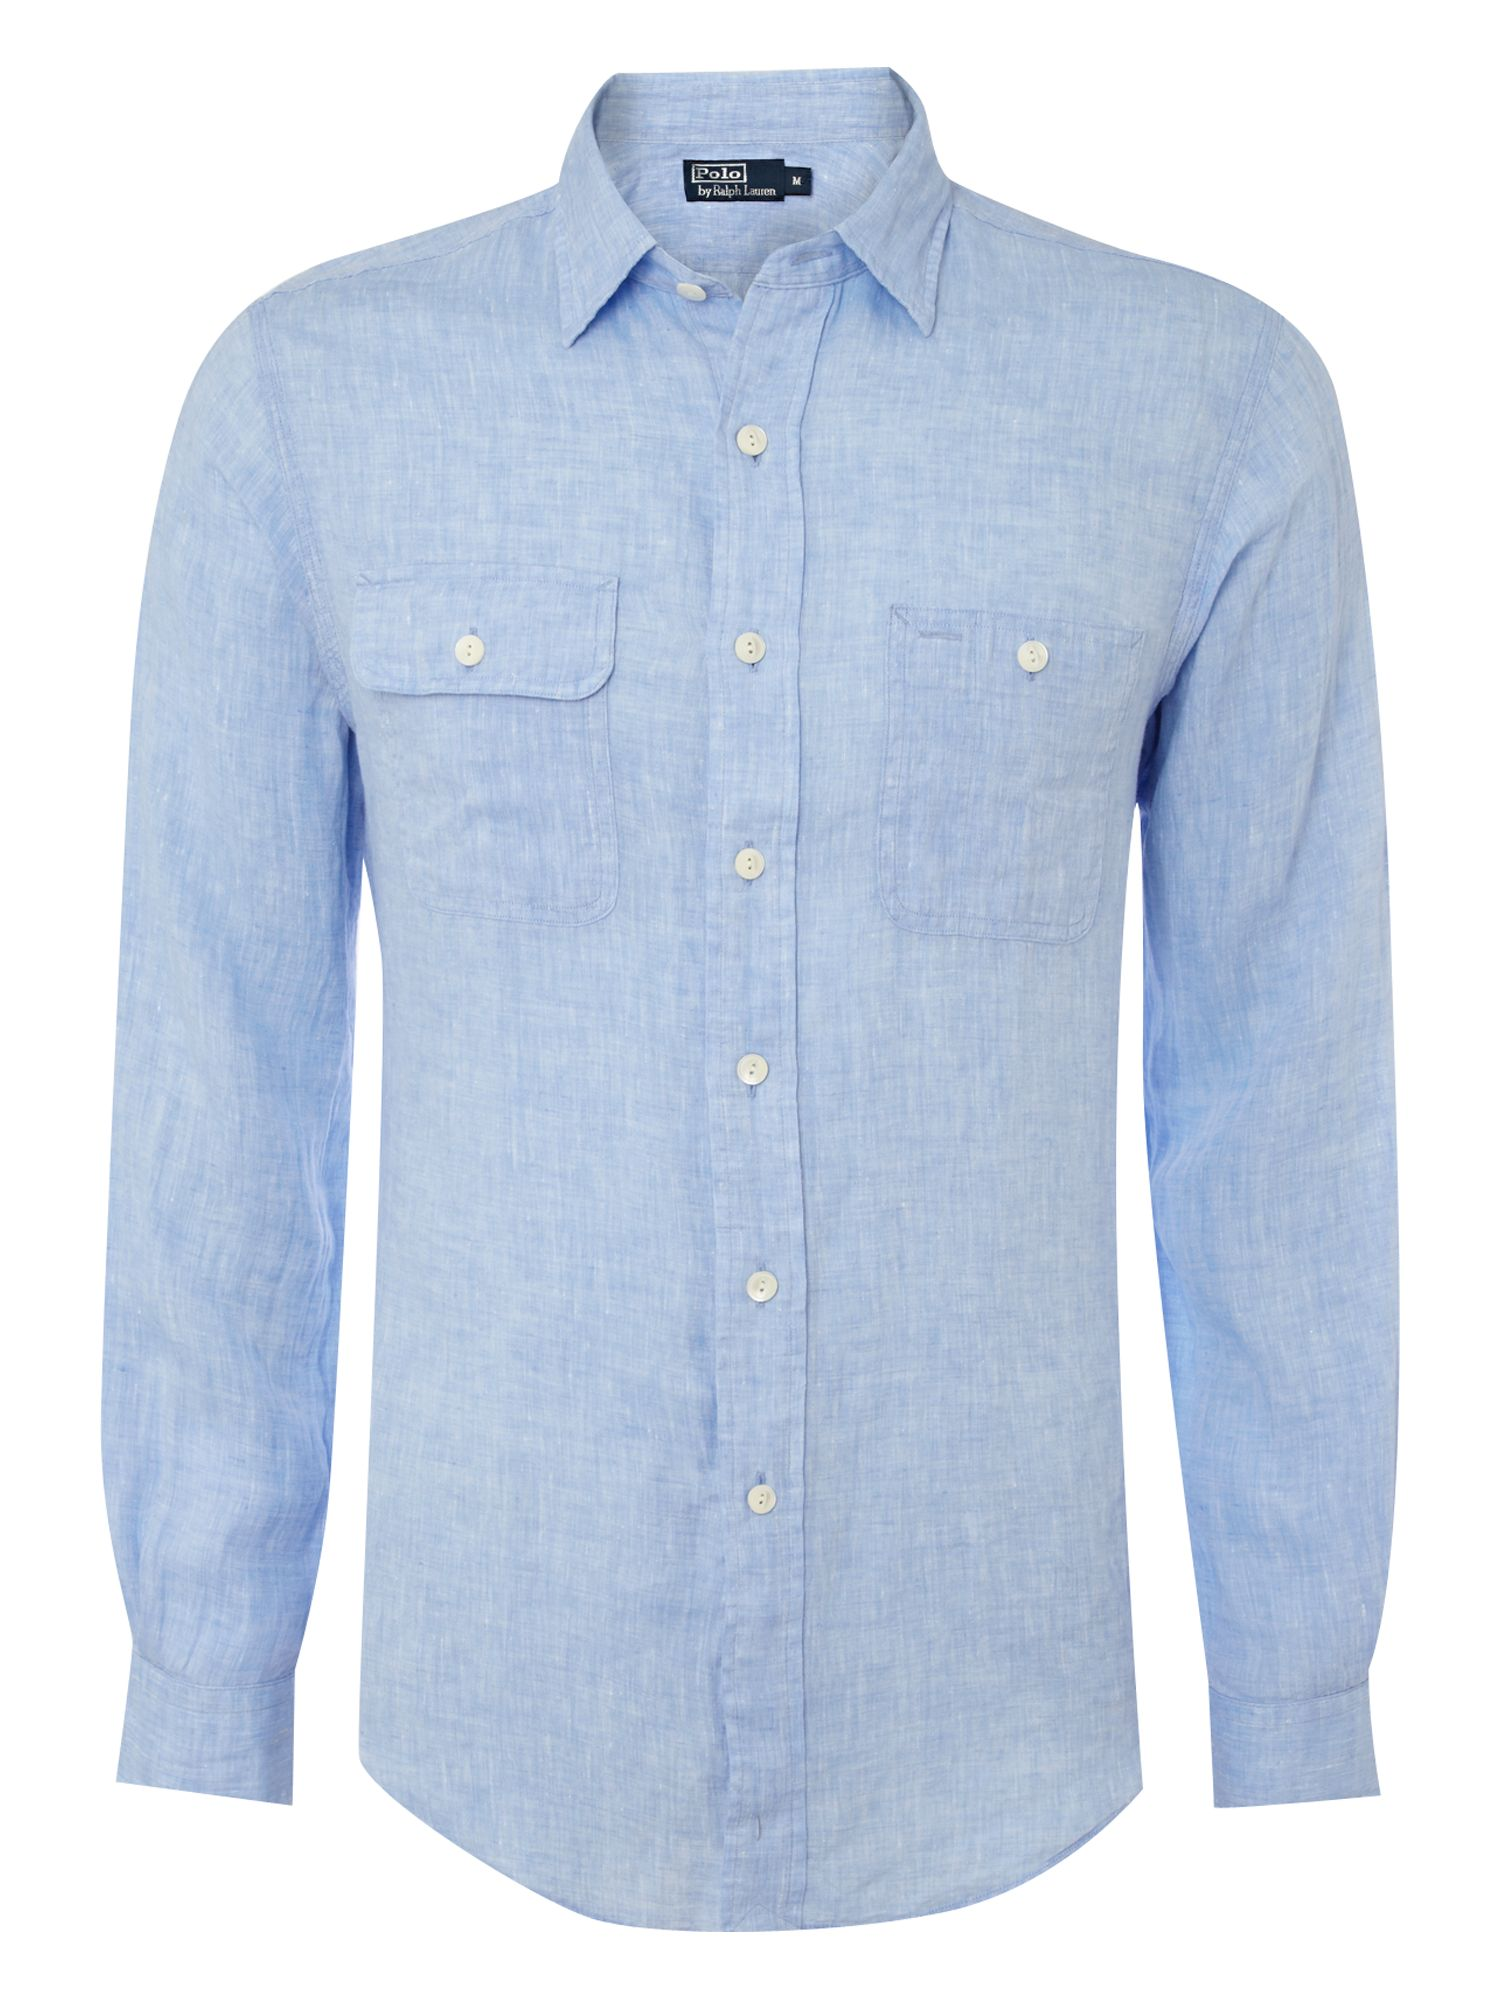 Polo ralph lauren custom fit linen shirt in blue for men for Custom fit dress shirts